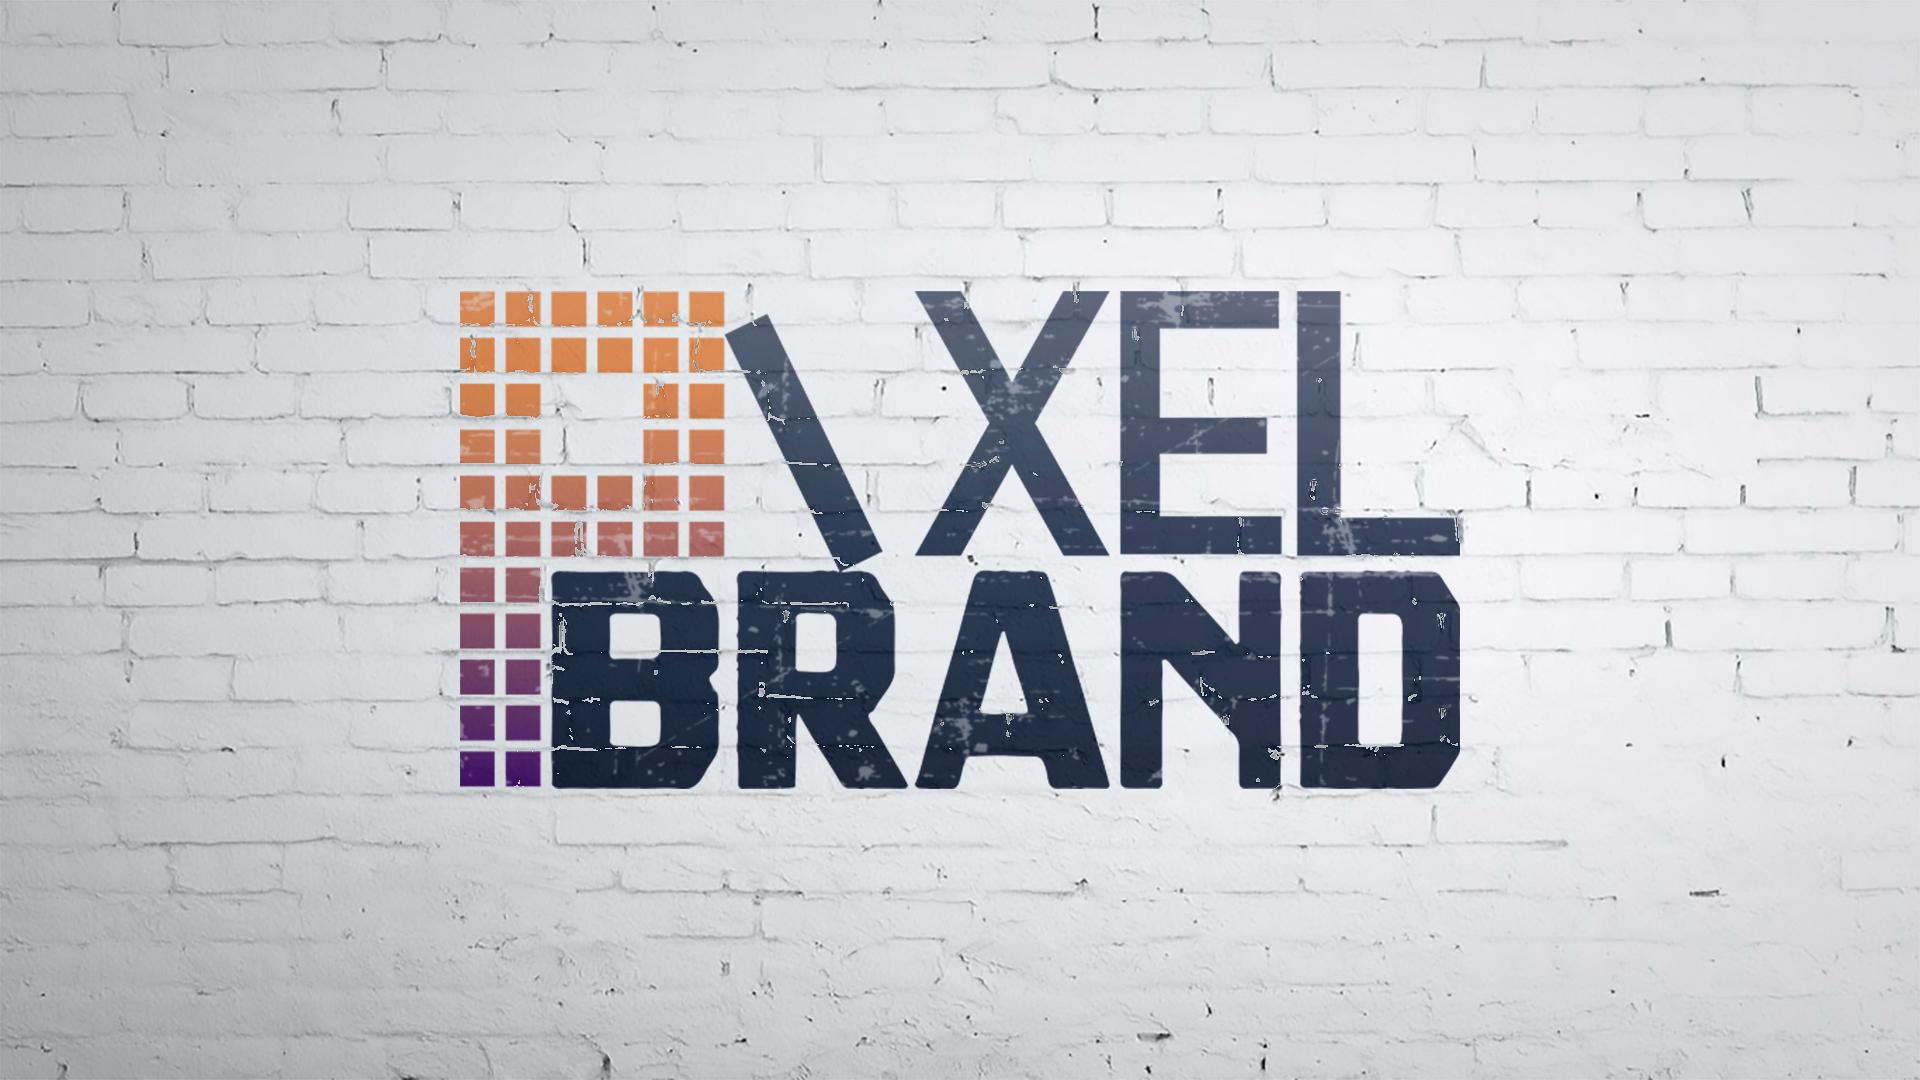 Pixel Brand's logo on a white wall